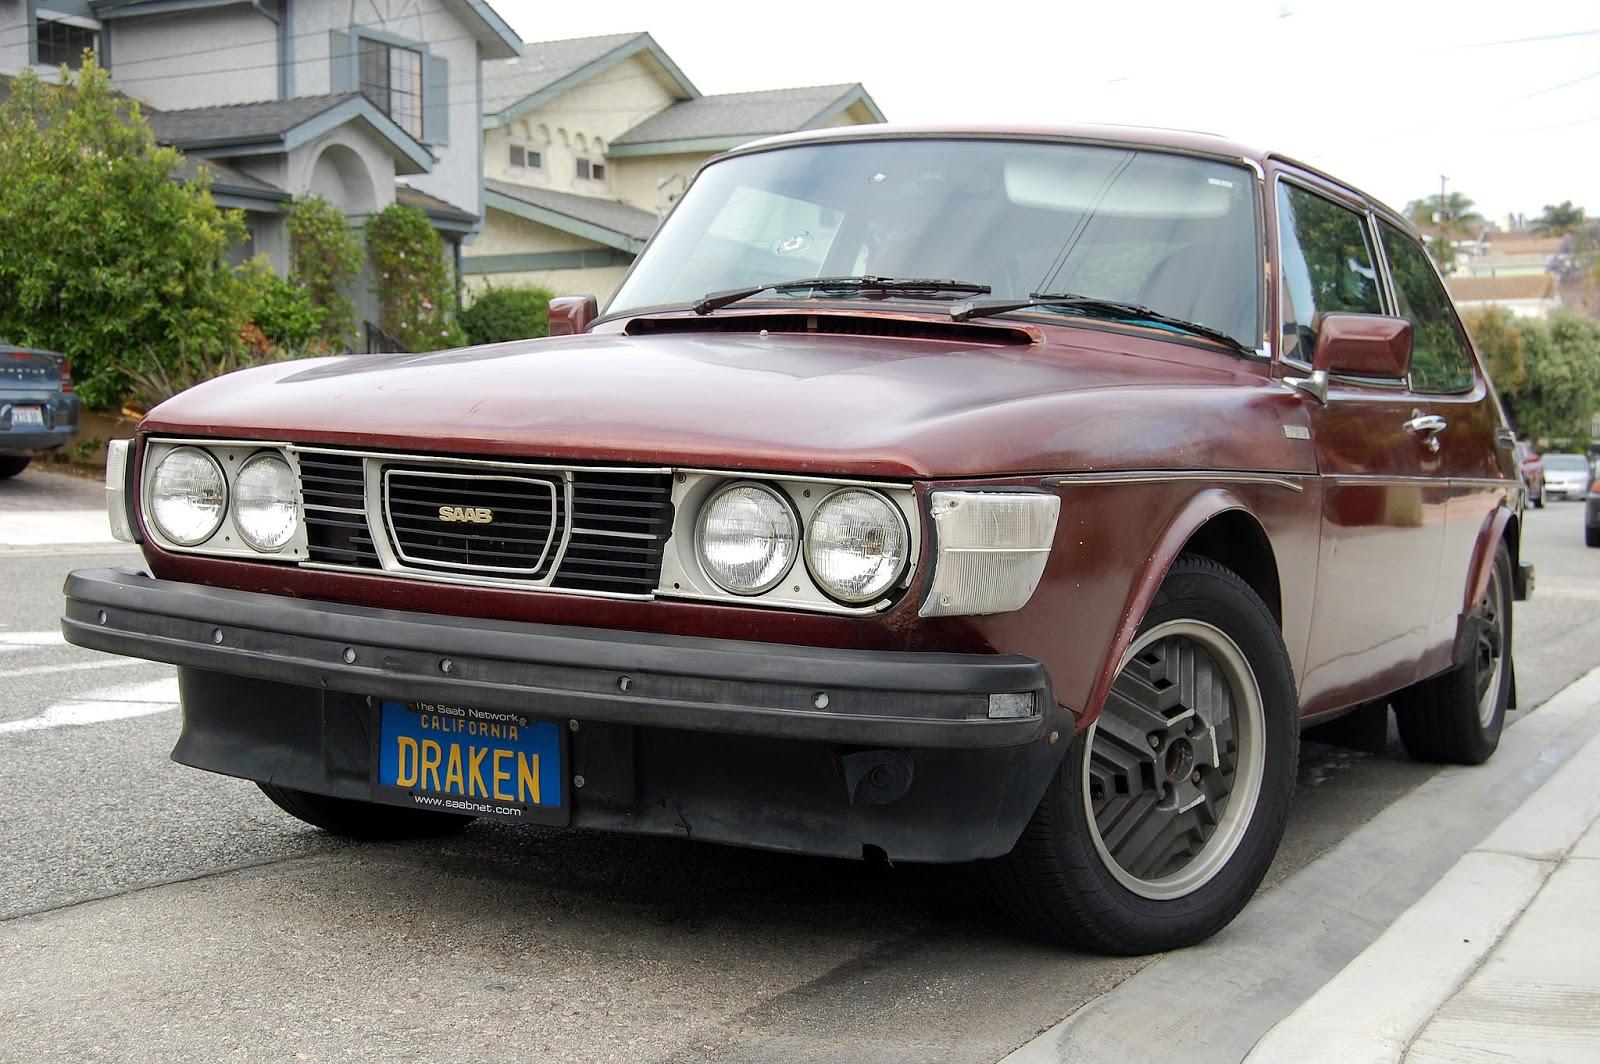 18135989320_ec519473bd_k collection of diagram 1974 saab 99 millions ideas diagram and,Saab 99 Wiring Diagram